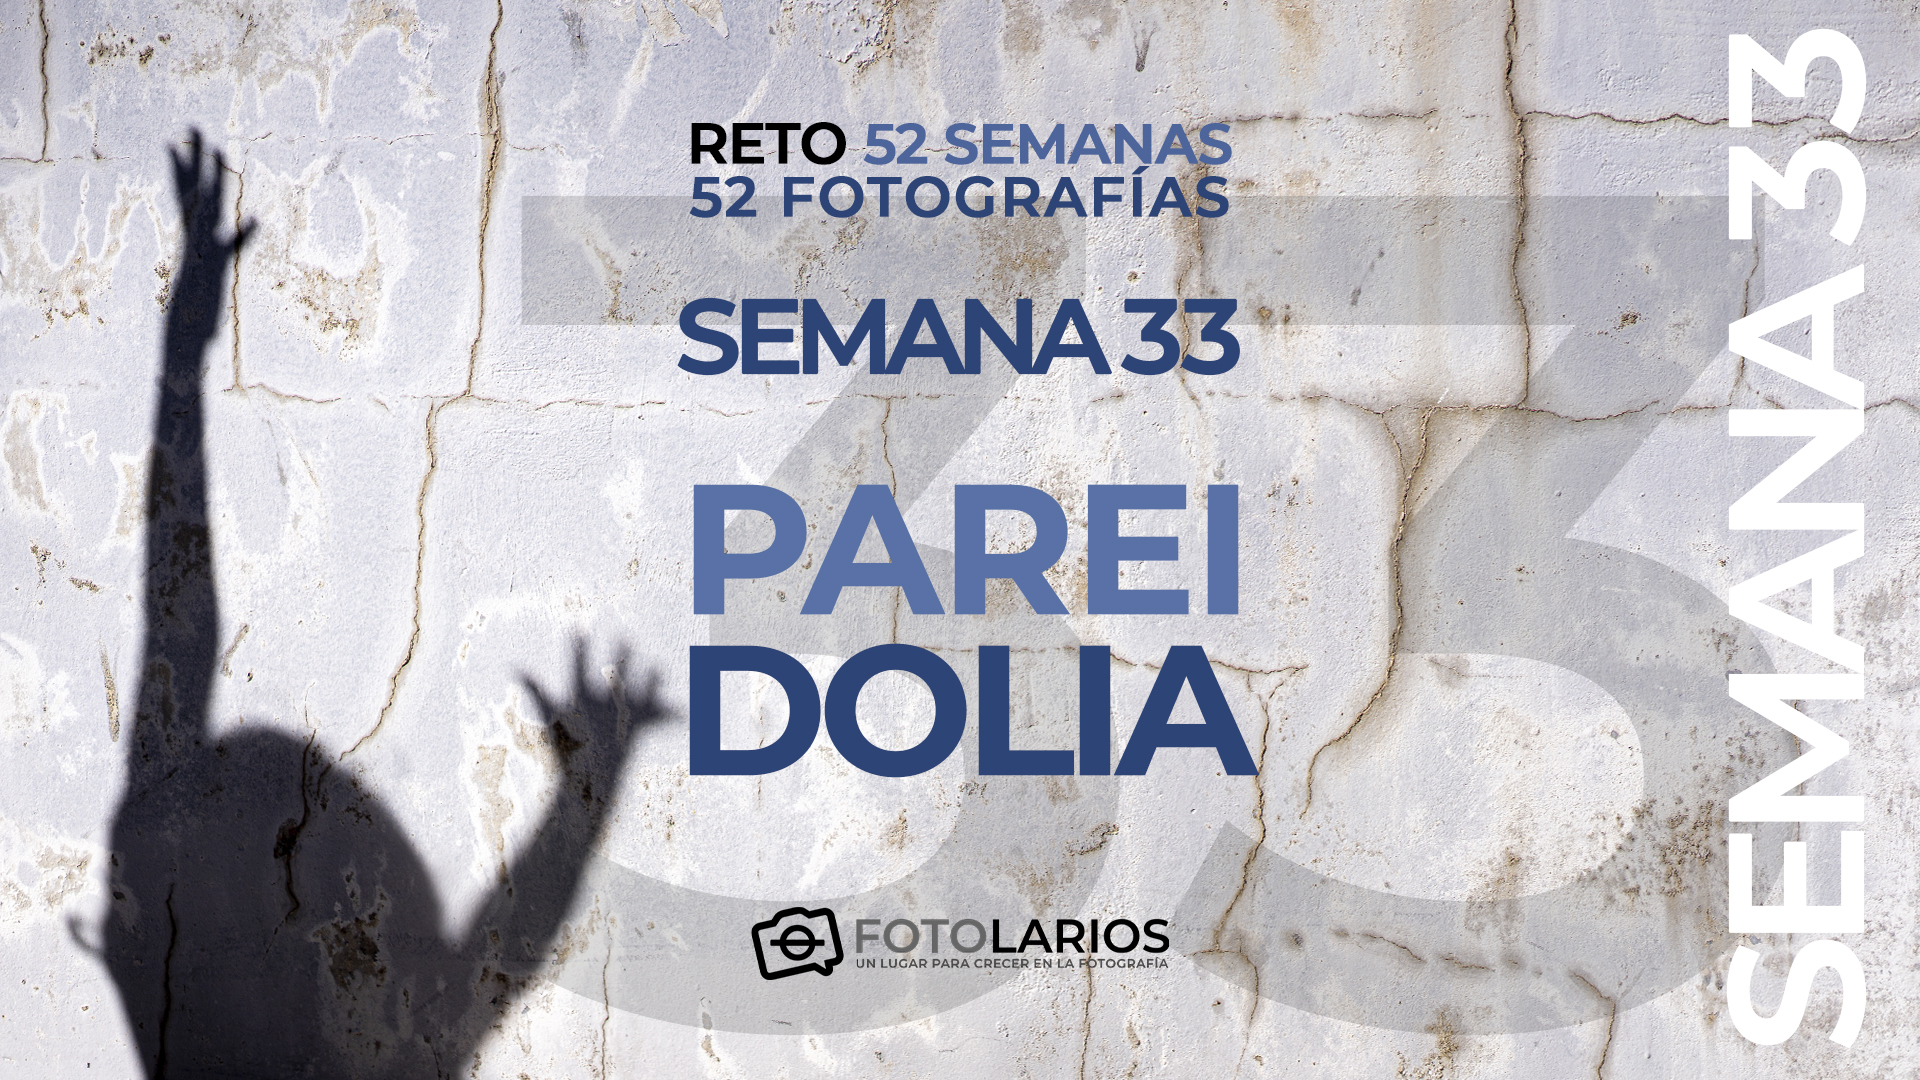 Reto 52 semanas - 33 - Pareidolia